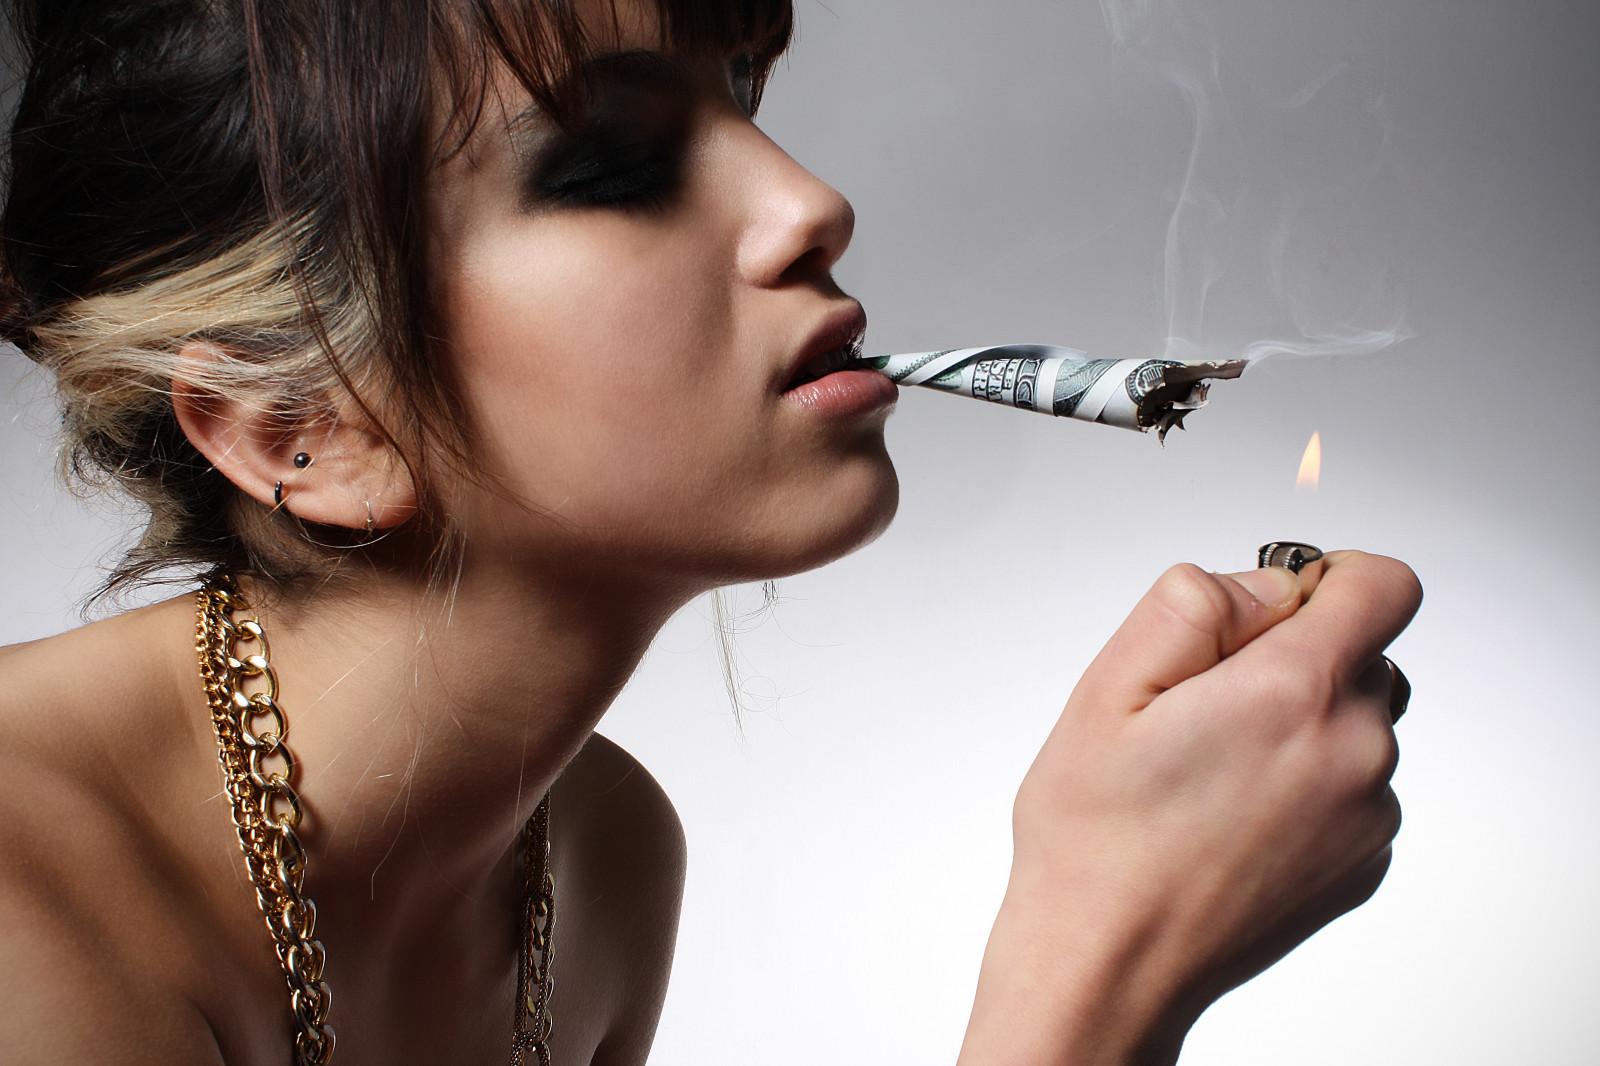 Girls Smoking Weed Hd Wallpaper Wallpaper Face Model Portrait Closed Eyes Brunette